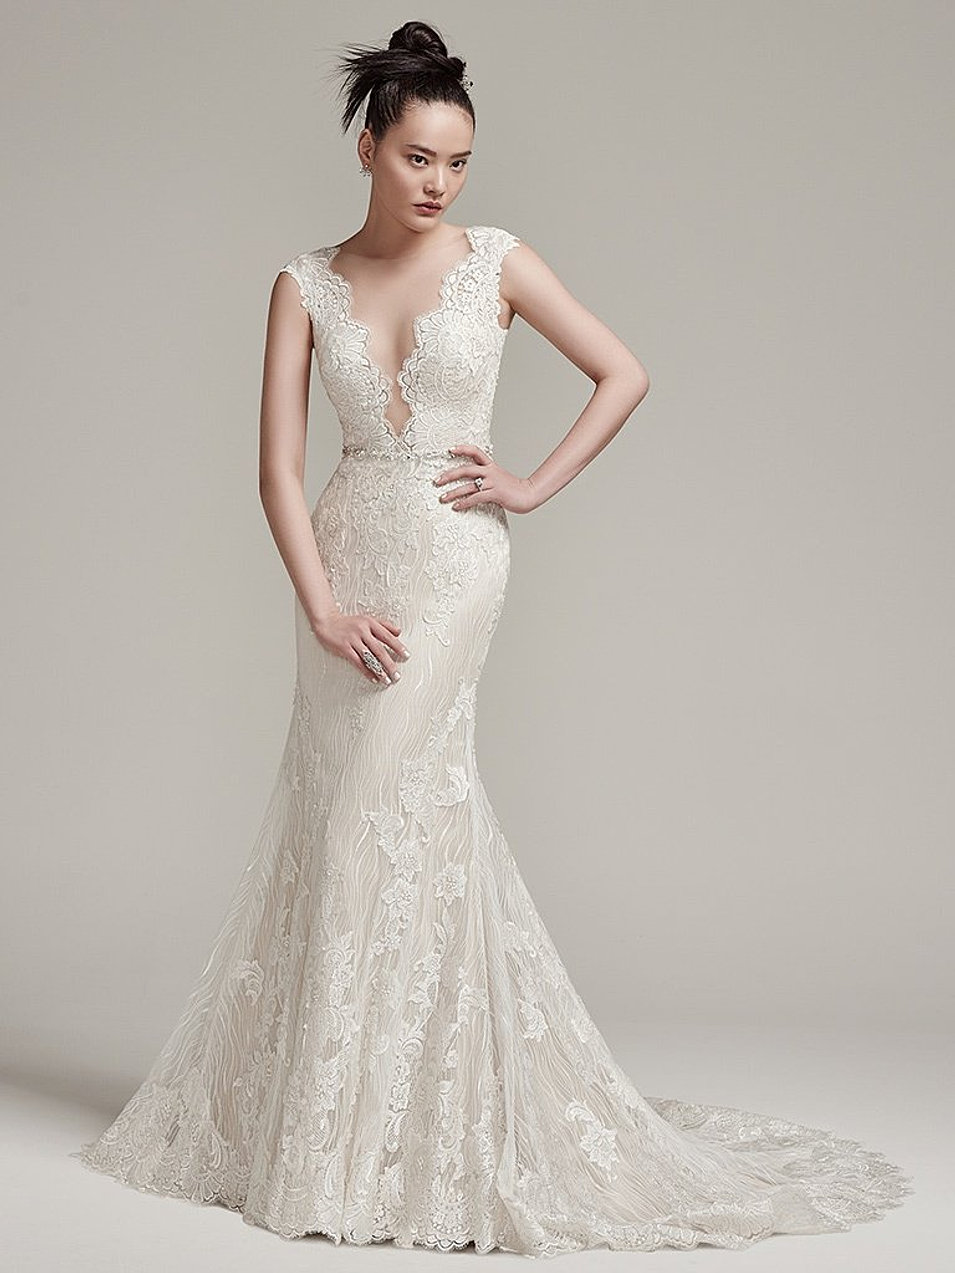 Wedding Dress Rental Nj. Cool Prom Tuxedo Rentals North New Jersey ...